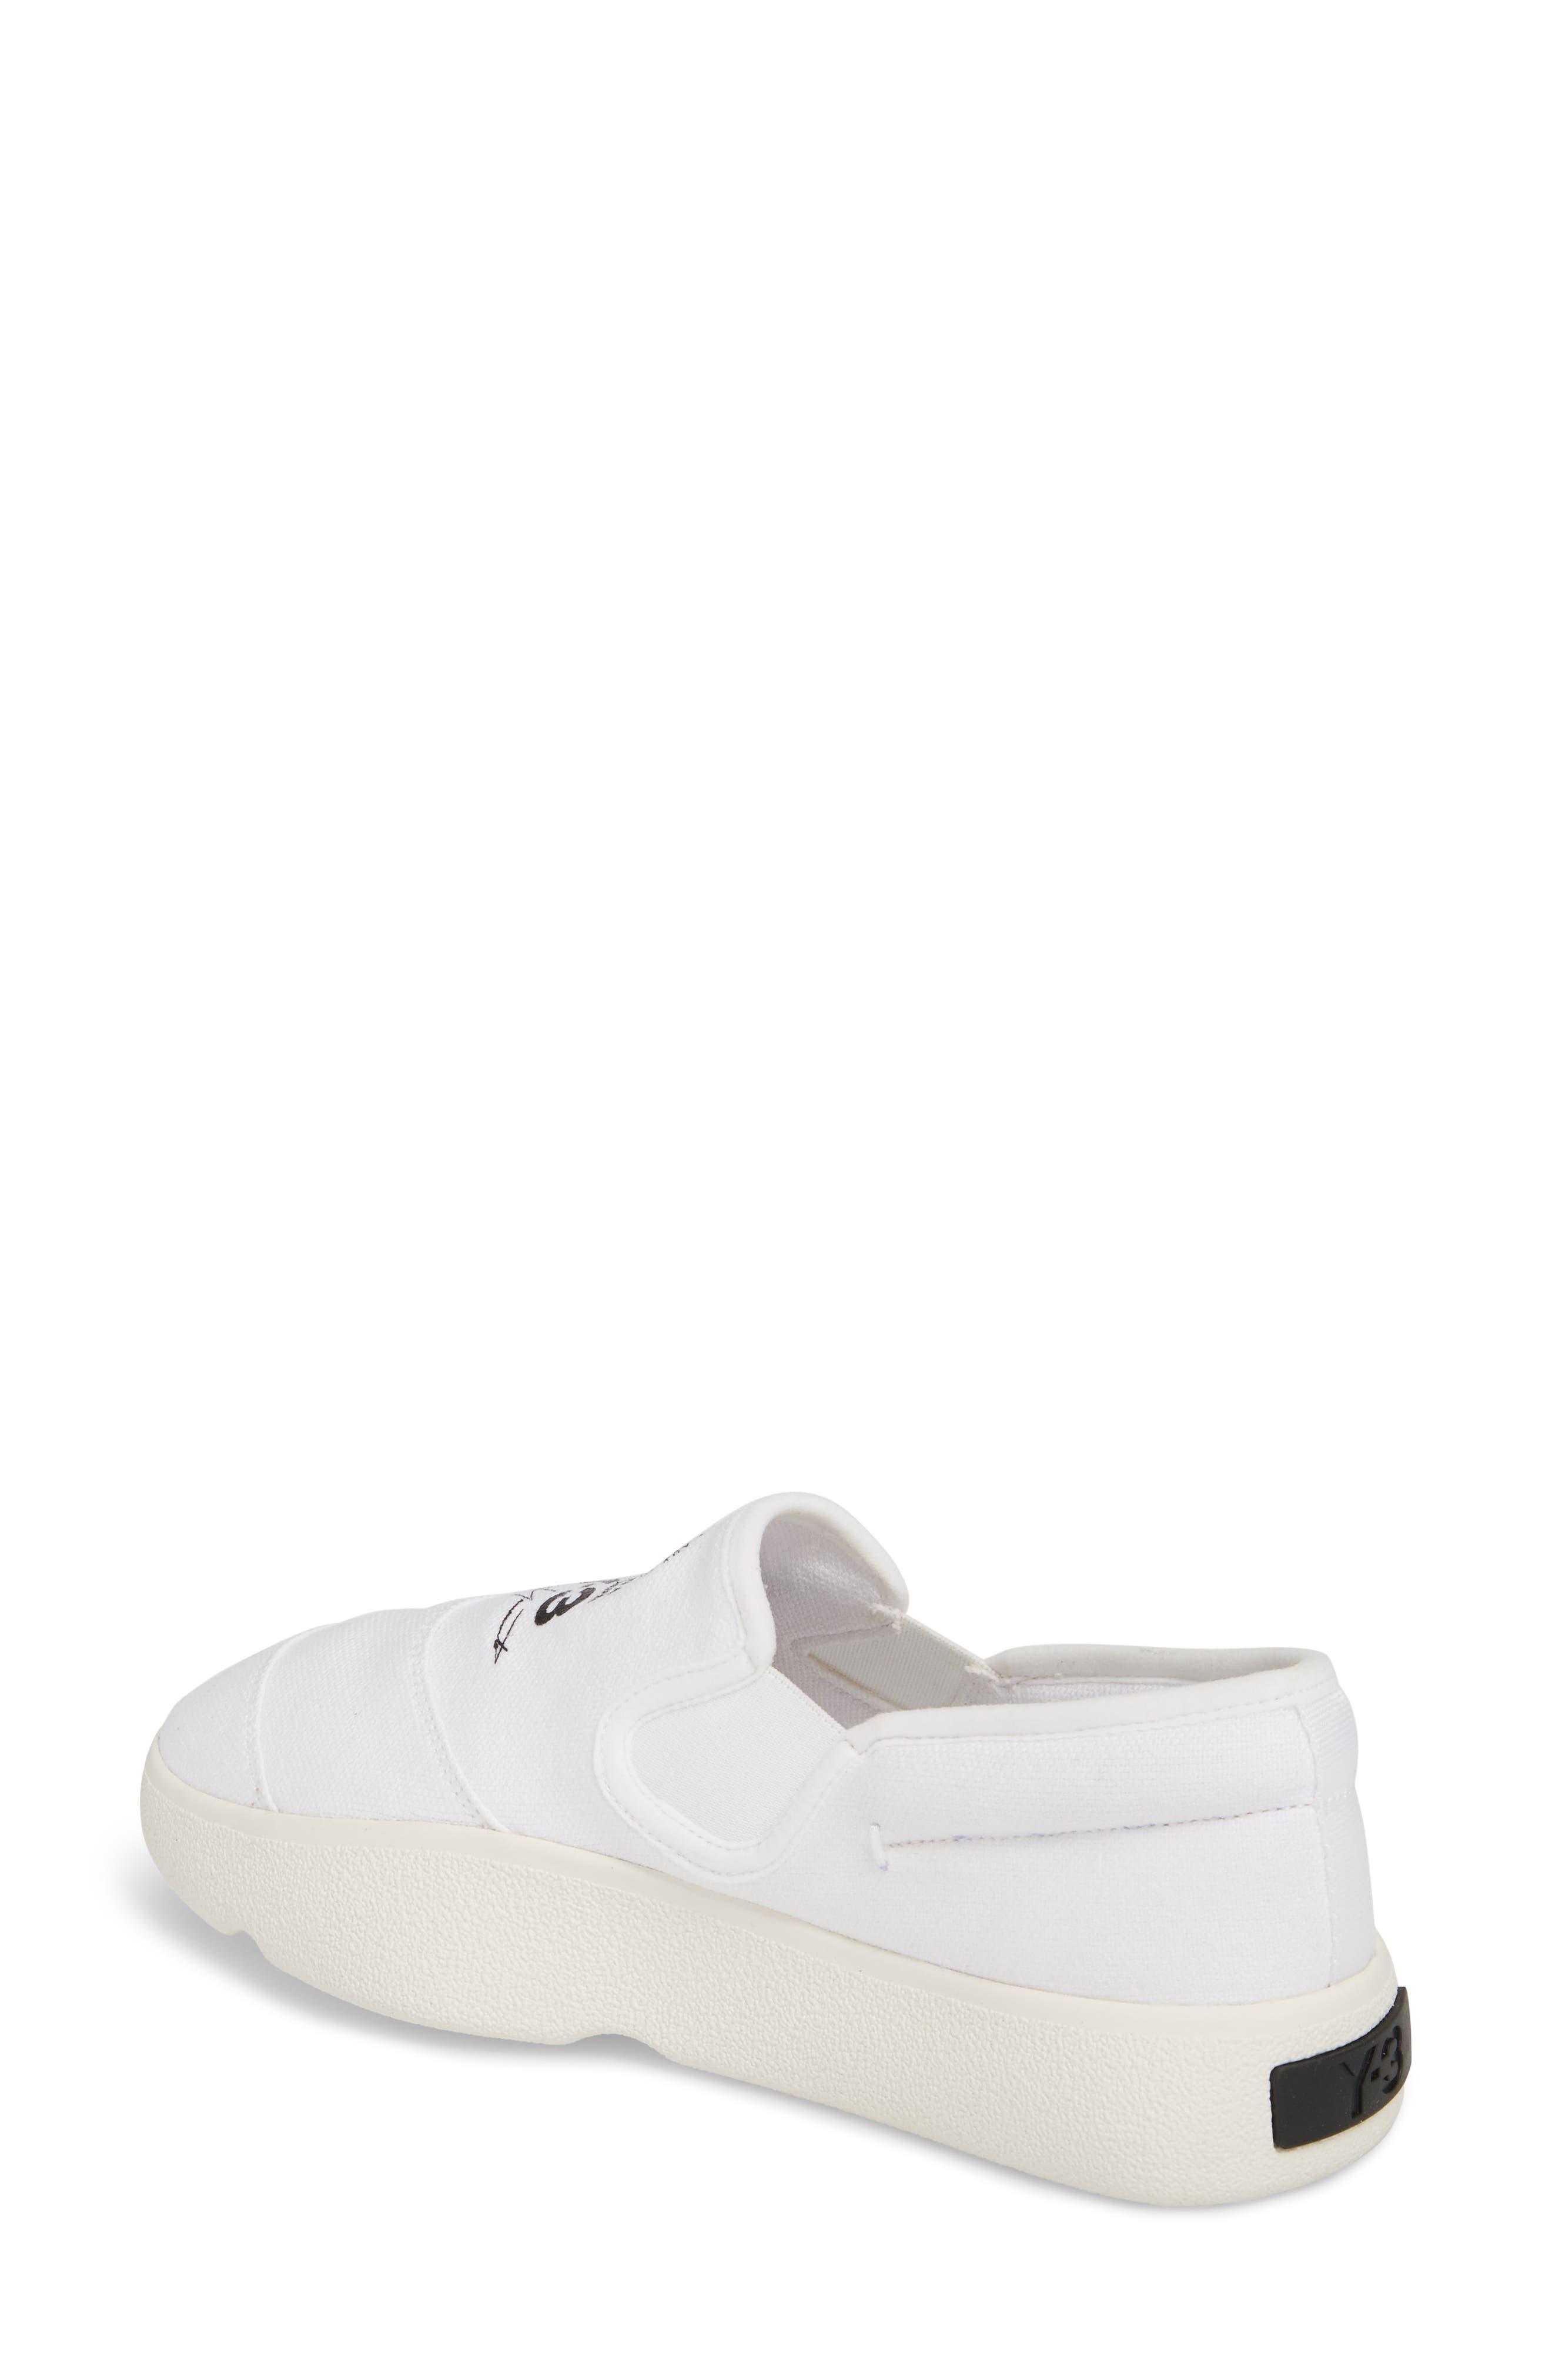 Alternate Image 2  - Y-3 Tangutsu Slip-On Sneaker (Women)